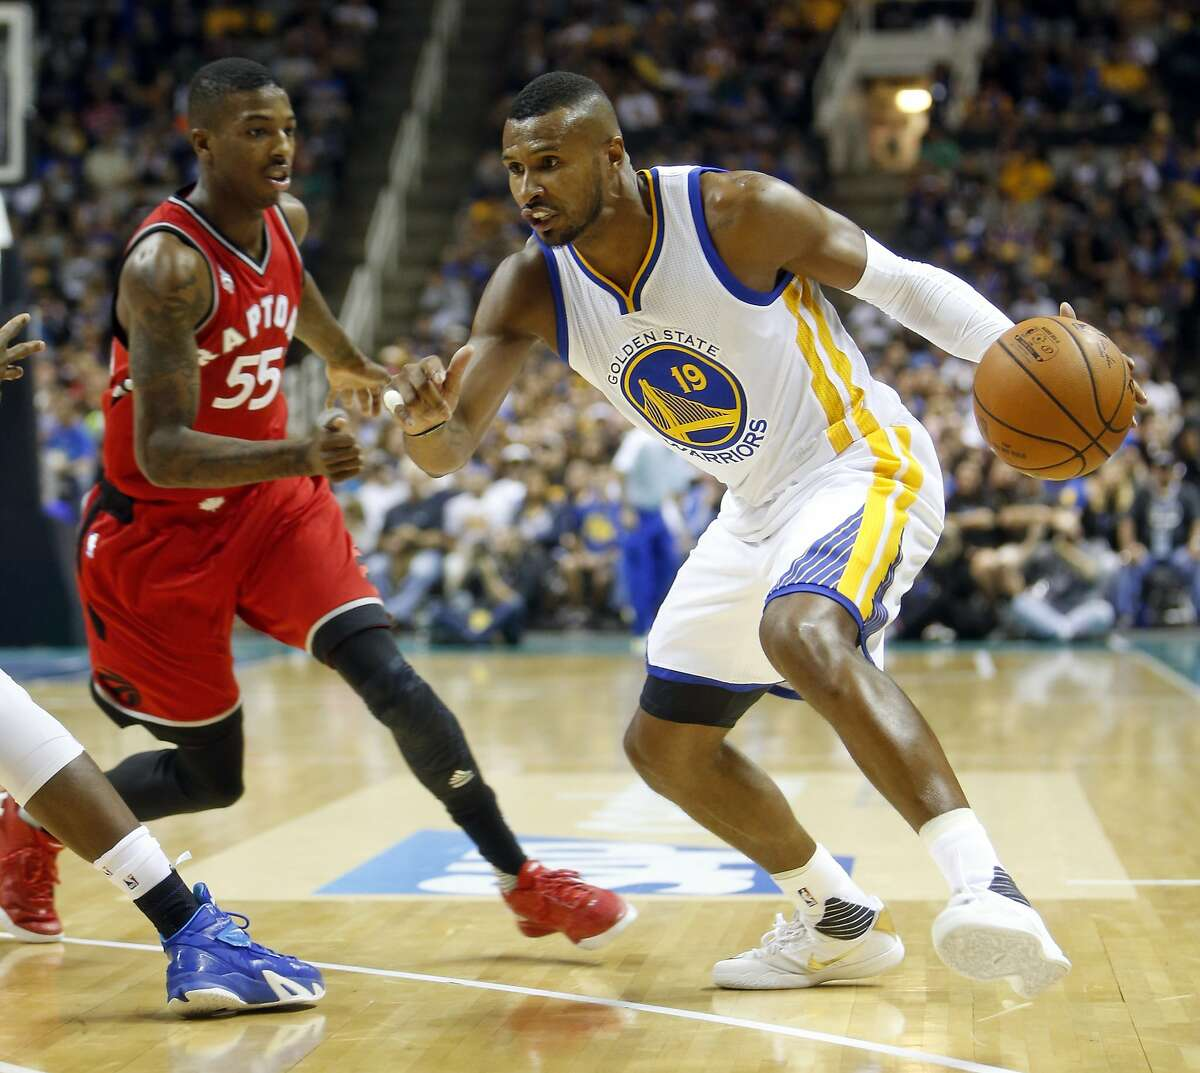 Golden State Warriors' Leandro Barbosa drives against Toronto Raptors' Delon Wright in 2n quarter of Warriors' 95-87 win during NBA preseason game at SAP Center in San Jose, Calif., on Sunday, October 5, 2015.